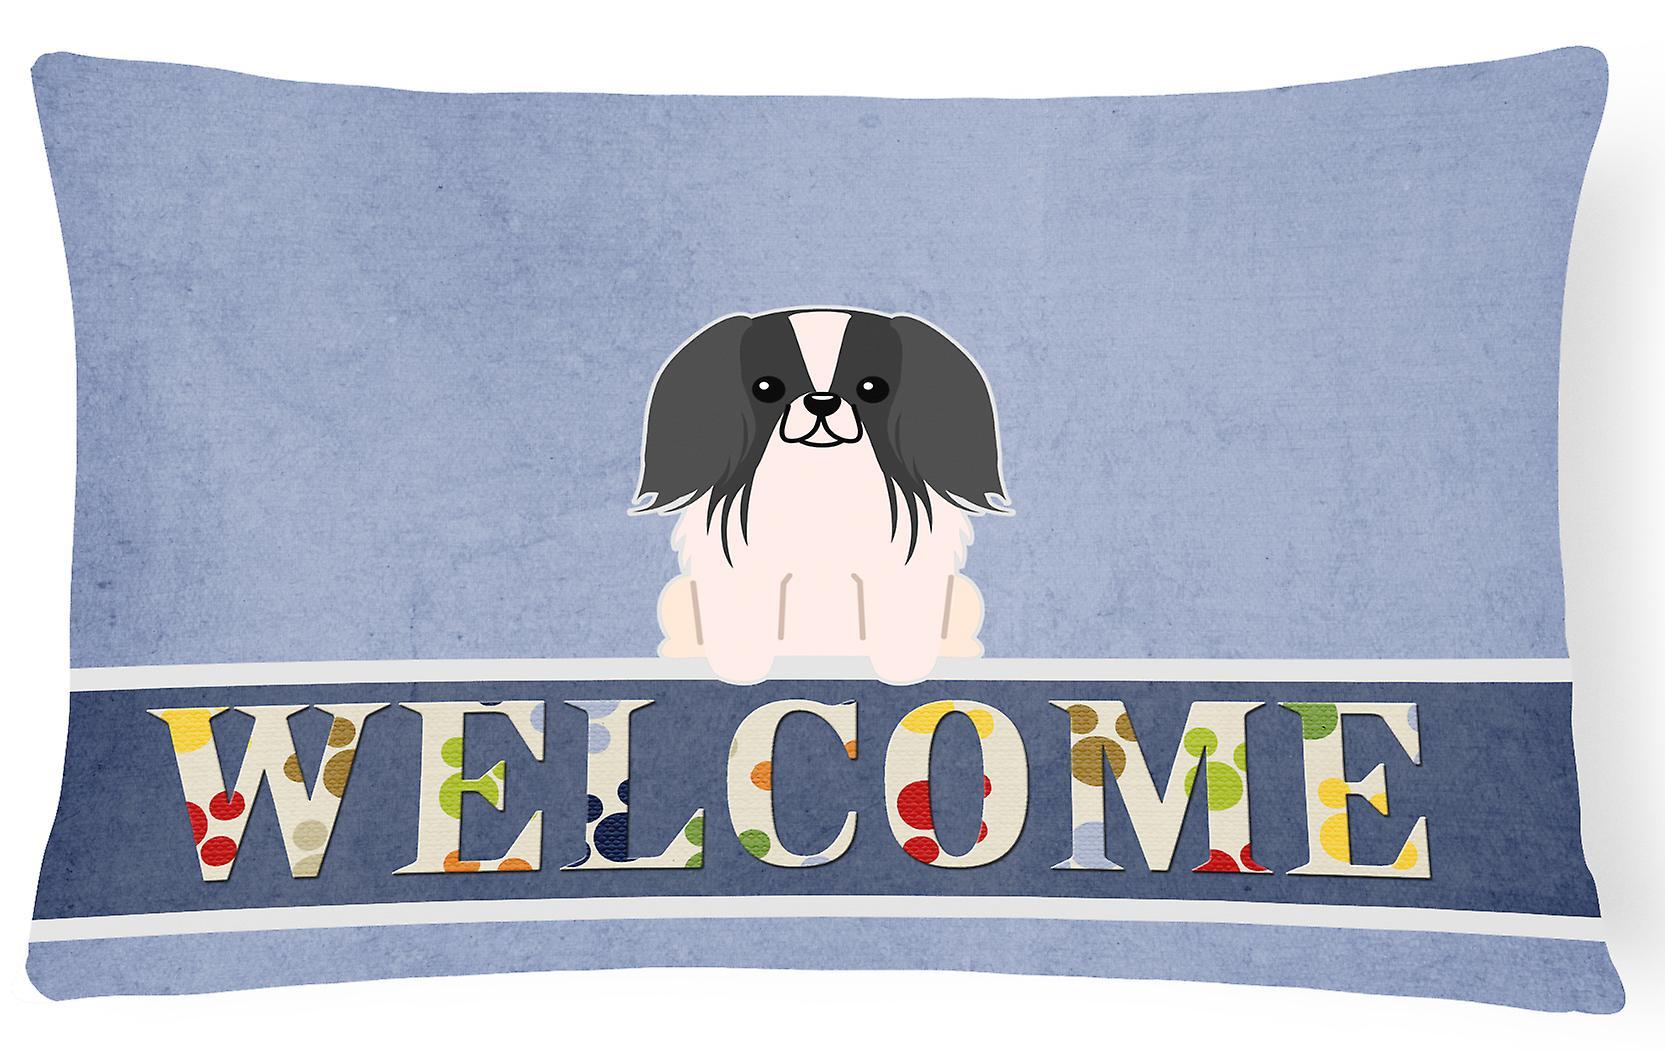 Tissu Oreiller Décoratif Noir Blanc Bienvenue Pekingnese Toile 4ALj35Rq